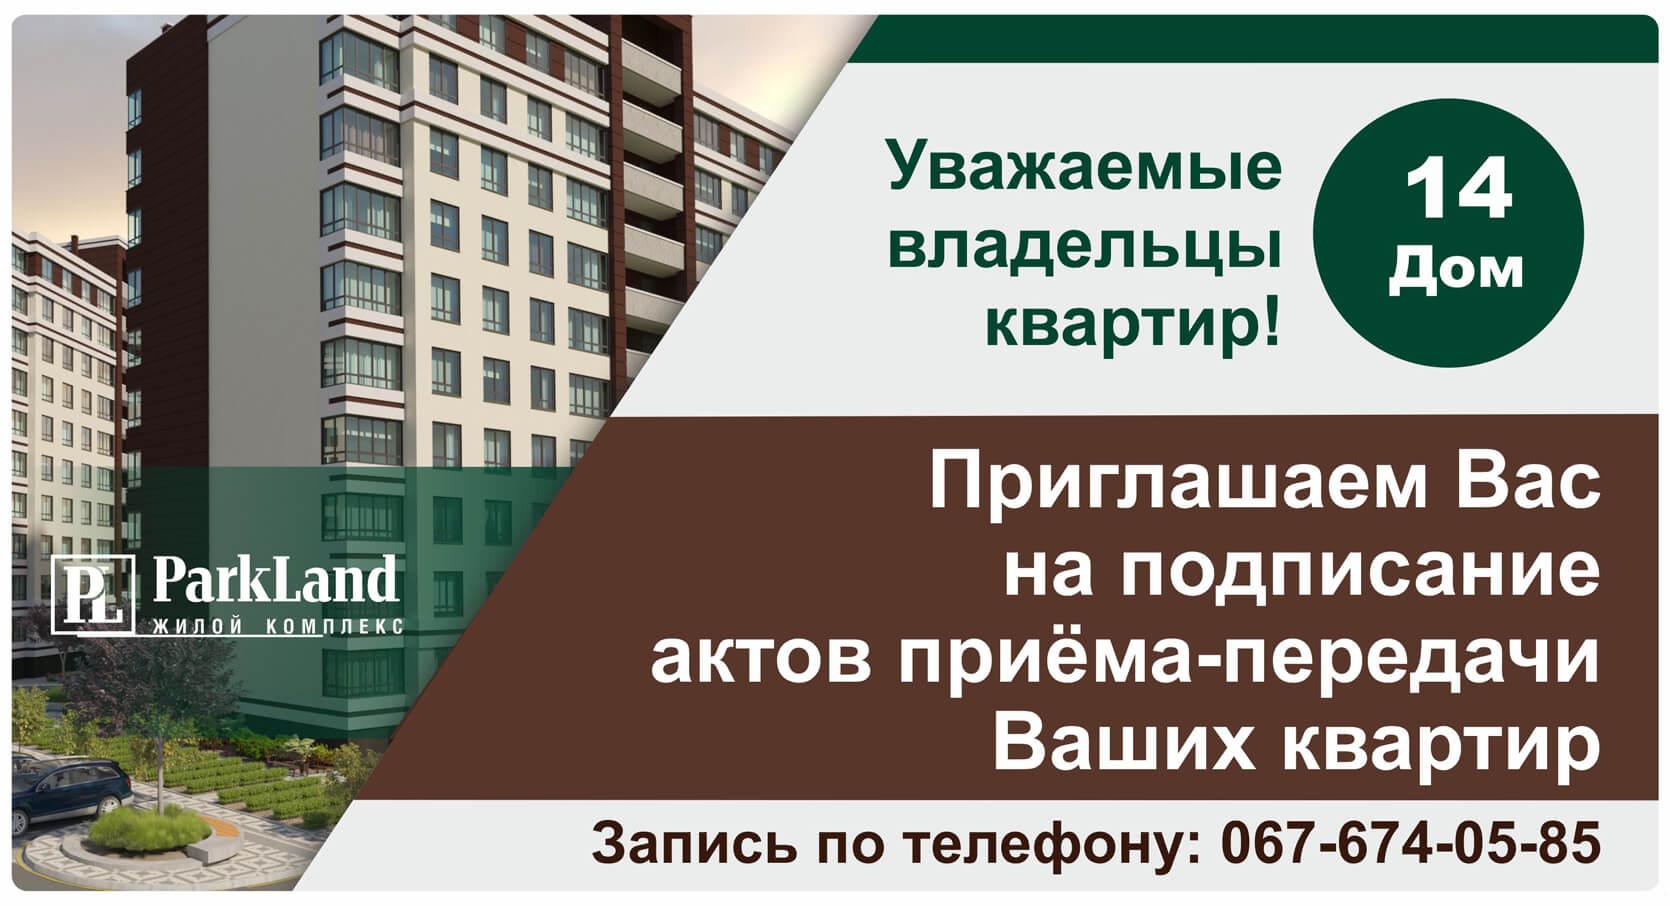 news170918-ru